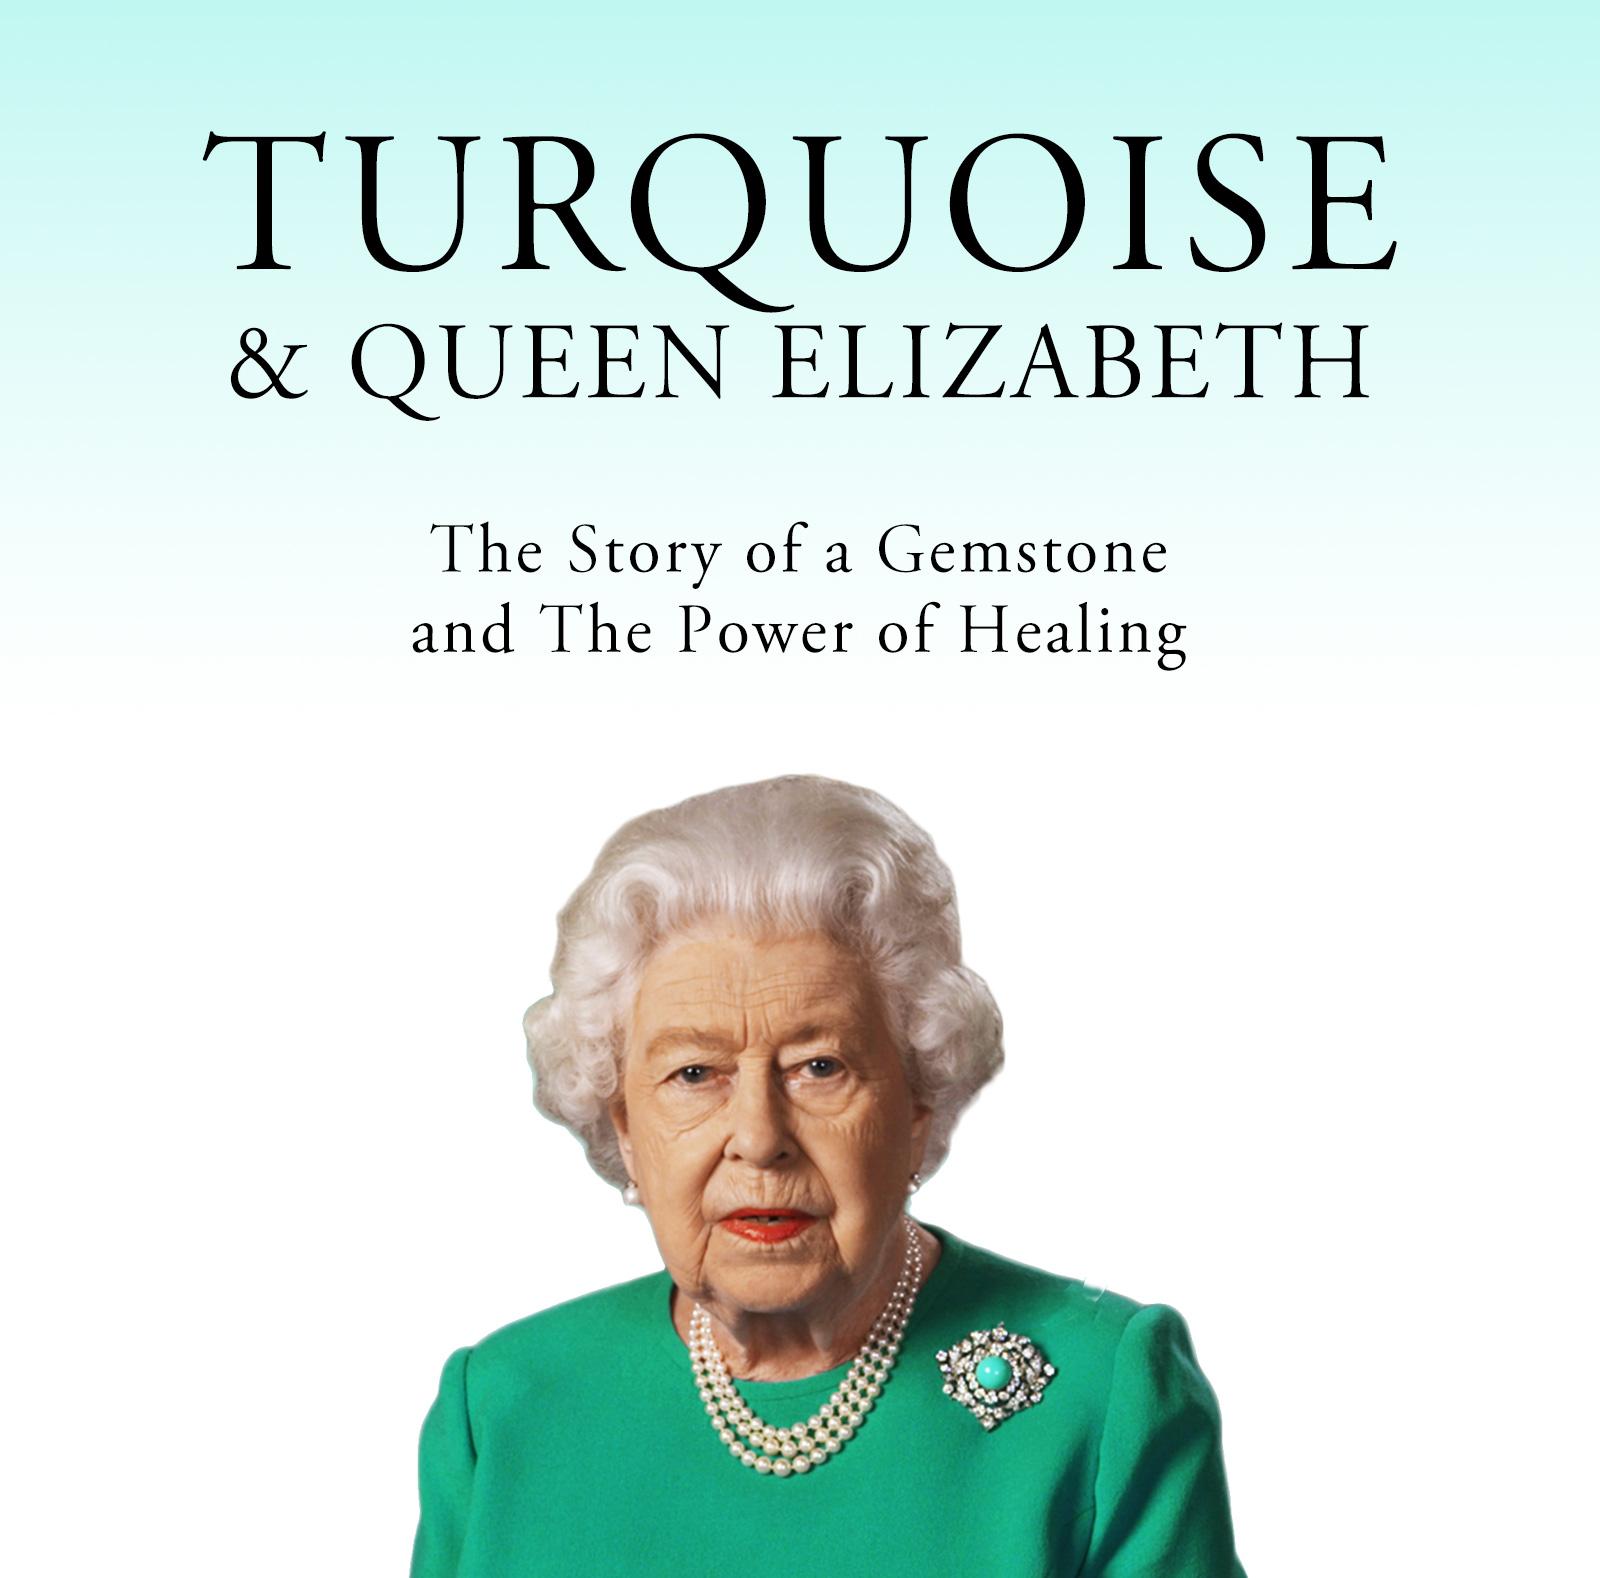 Turquoise & Queen Elizabeth